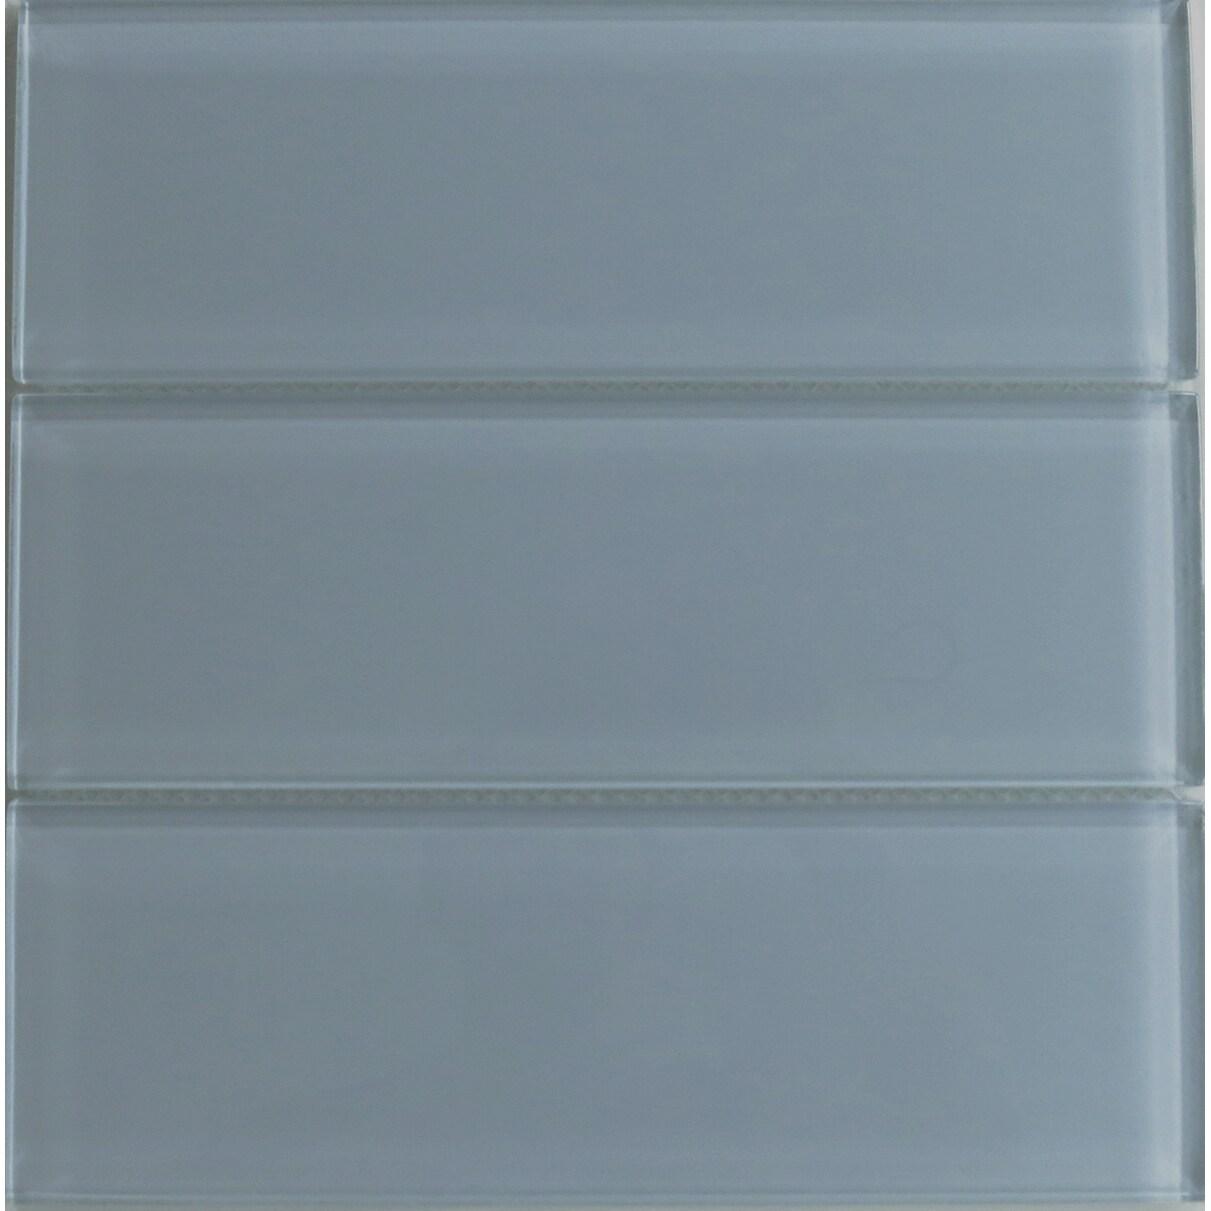 Modwalls Fog Bank Gray 4x12 Lush Glass Subway Tile (Fog B...